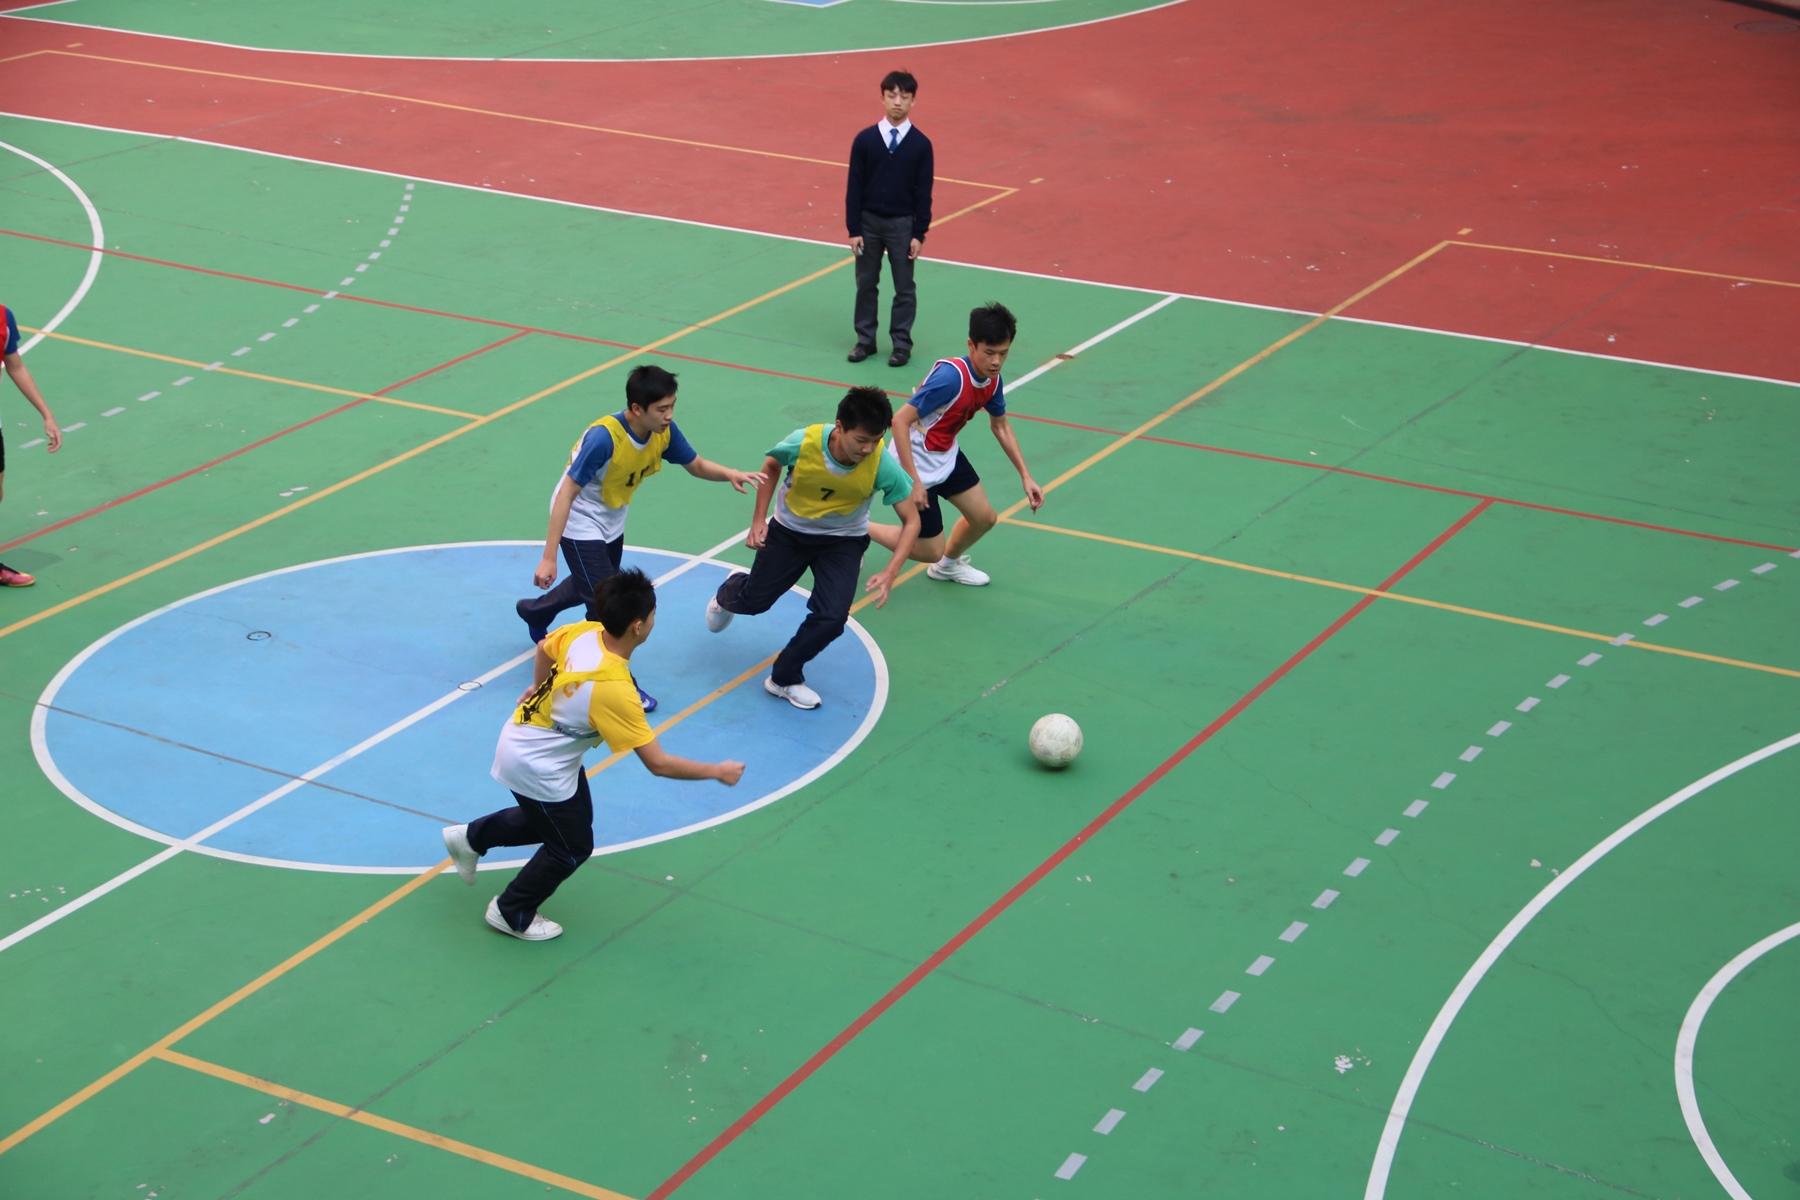 http://npc.edu.hk/sites/default/files/img_3174.jpg